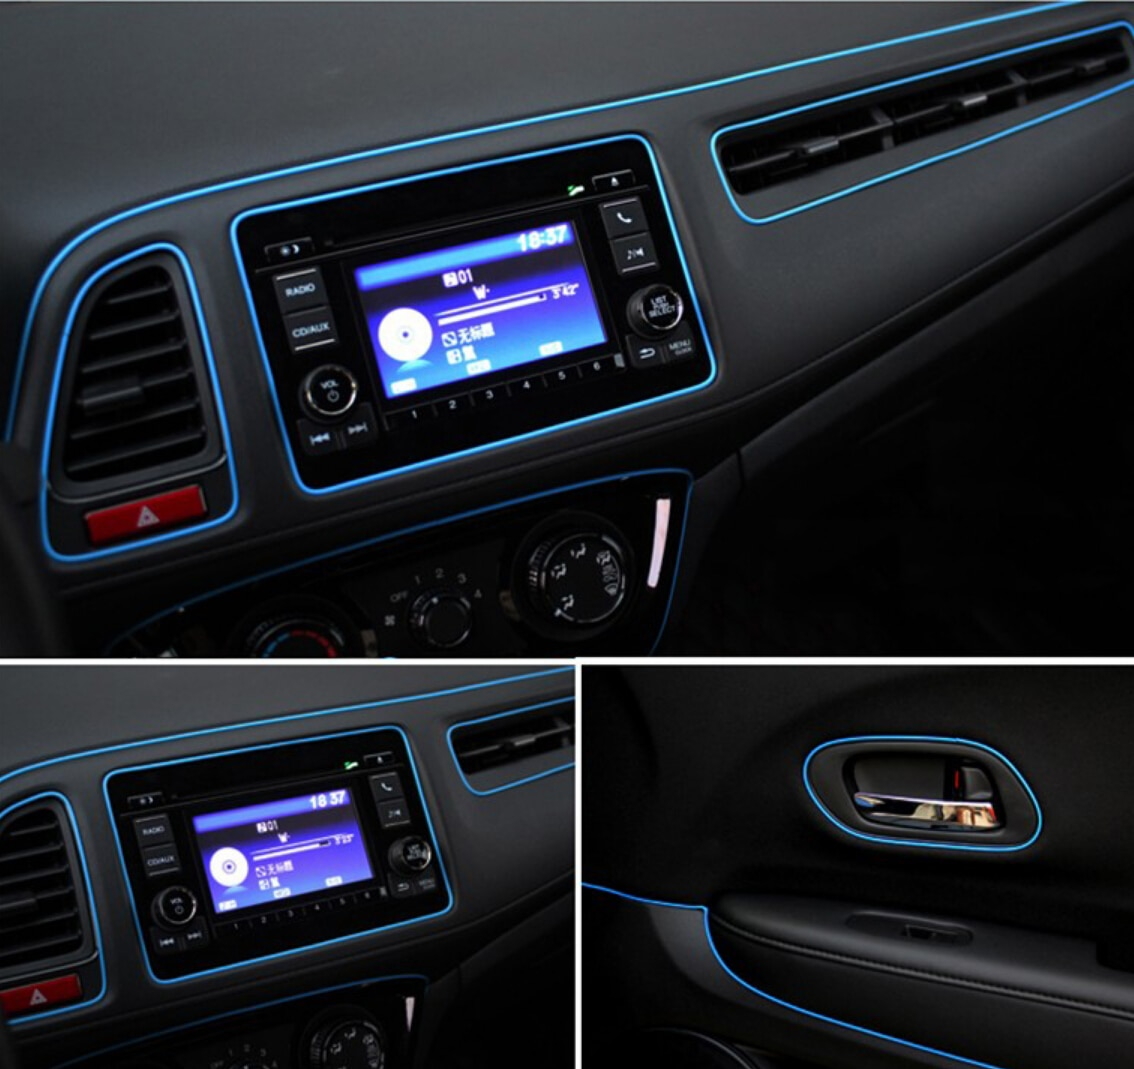 Coche-estilismo para el panel de mandos de tiras para Chevrolet Cruze Aveo Lacetti Captiva Cruz Niva chispa Orlando Epica navegar Sonic Lanos